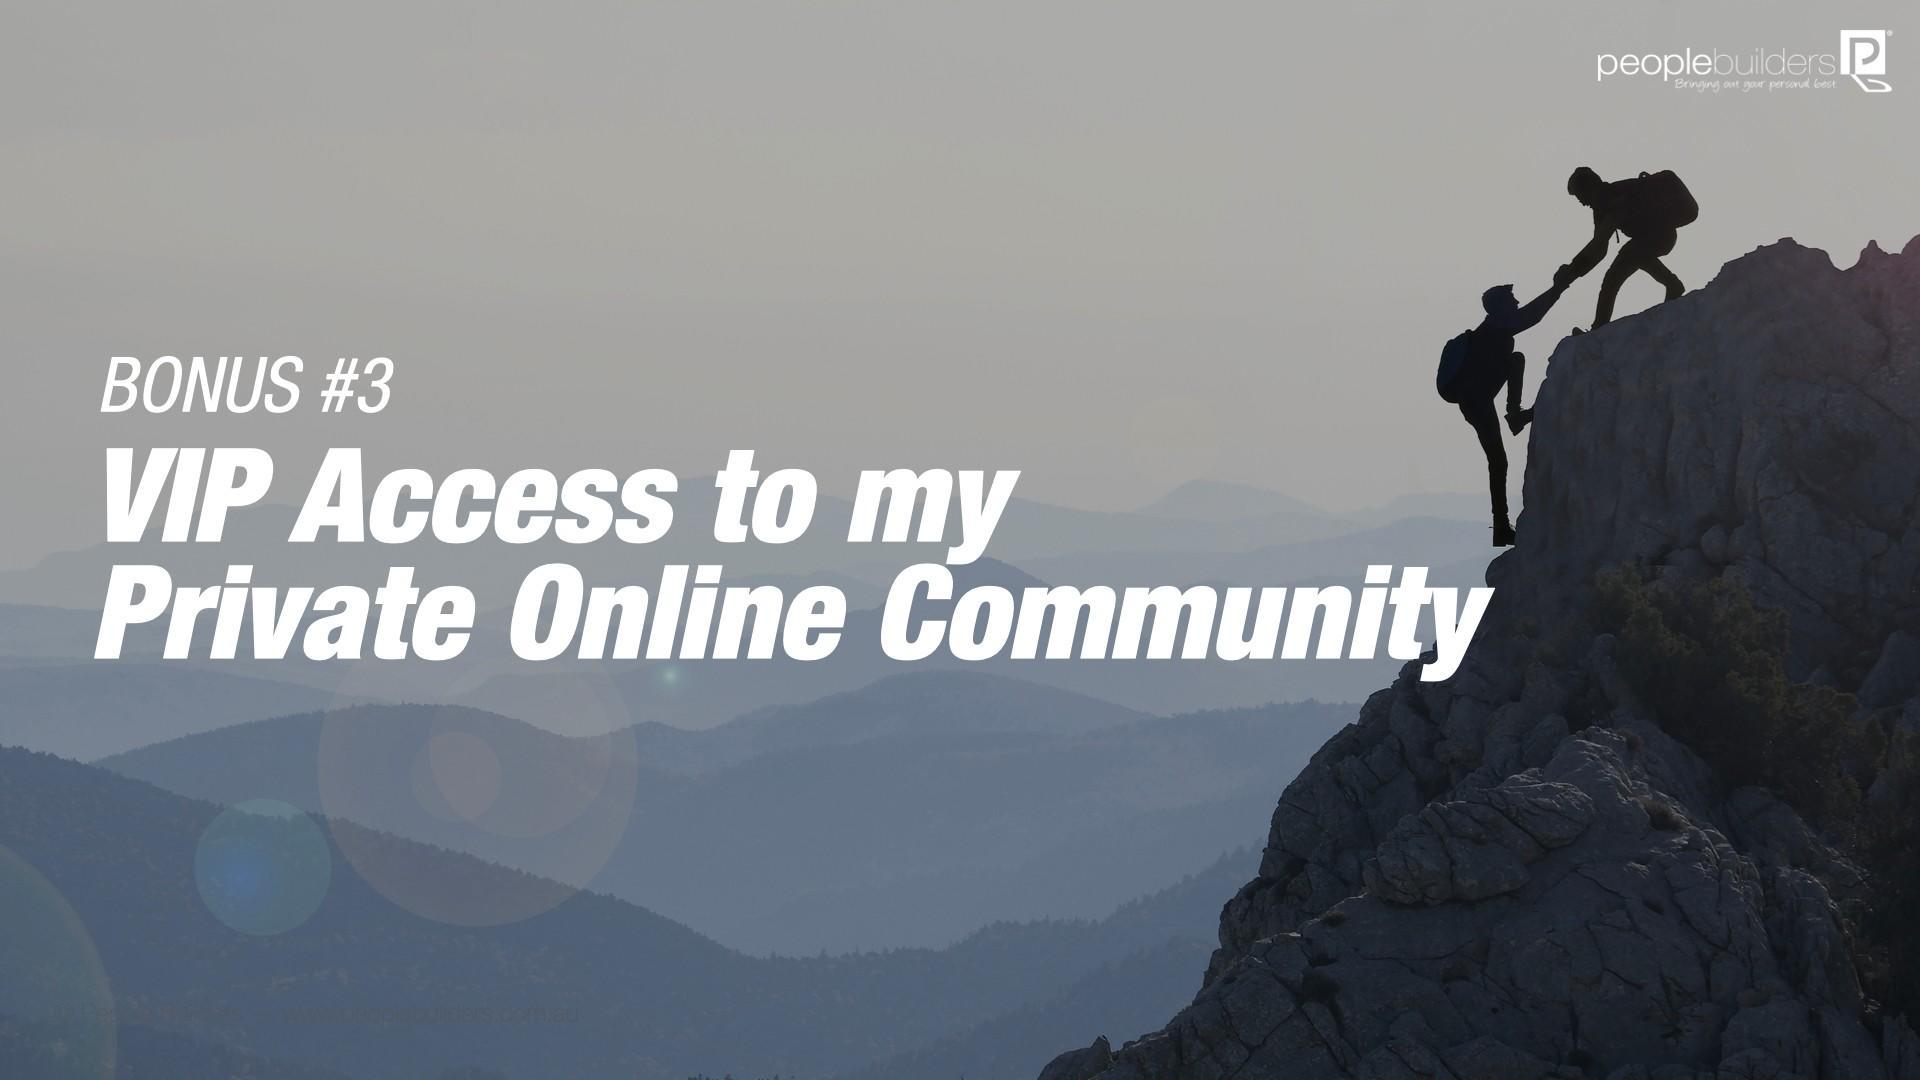 Bonus#3: VIP Access to My Private Online Community